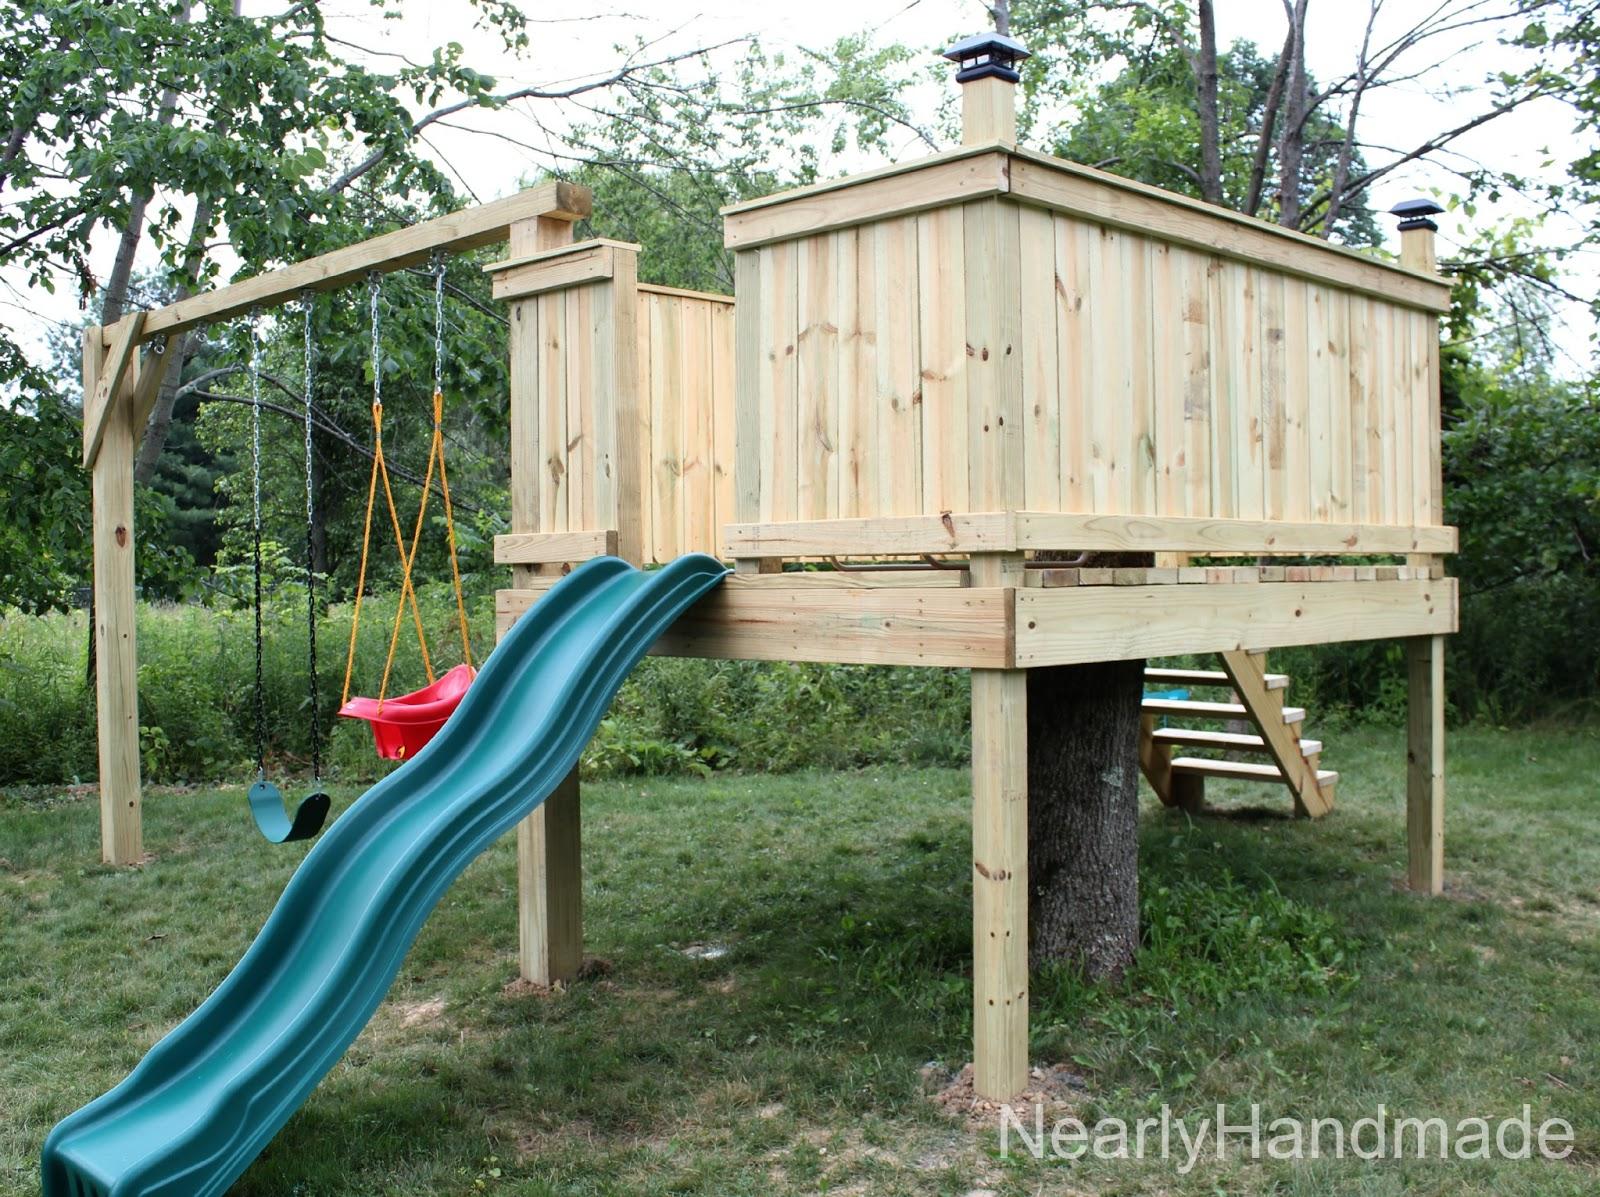 Handmade Tree Stump Tic Tac Toe Making Wood Porch Swing